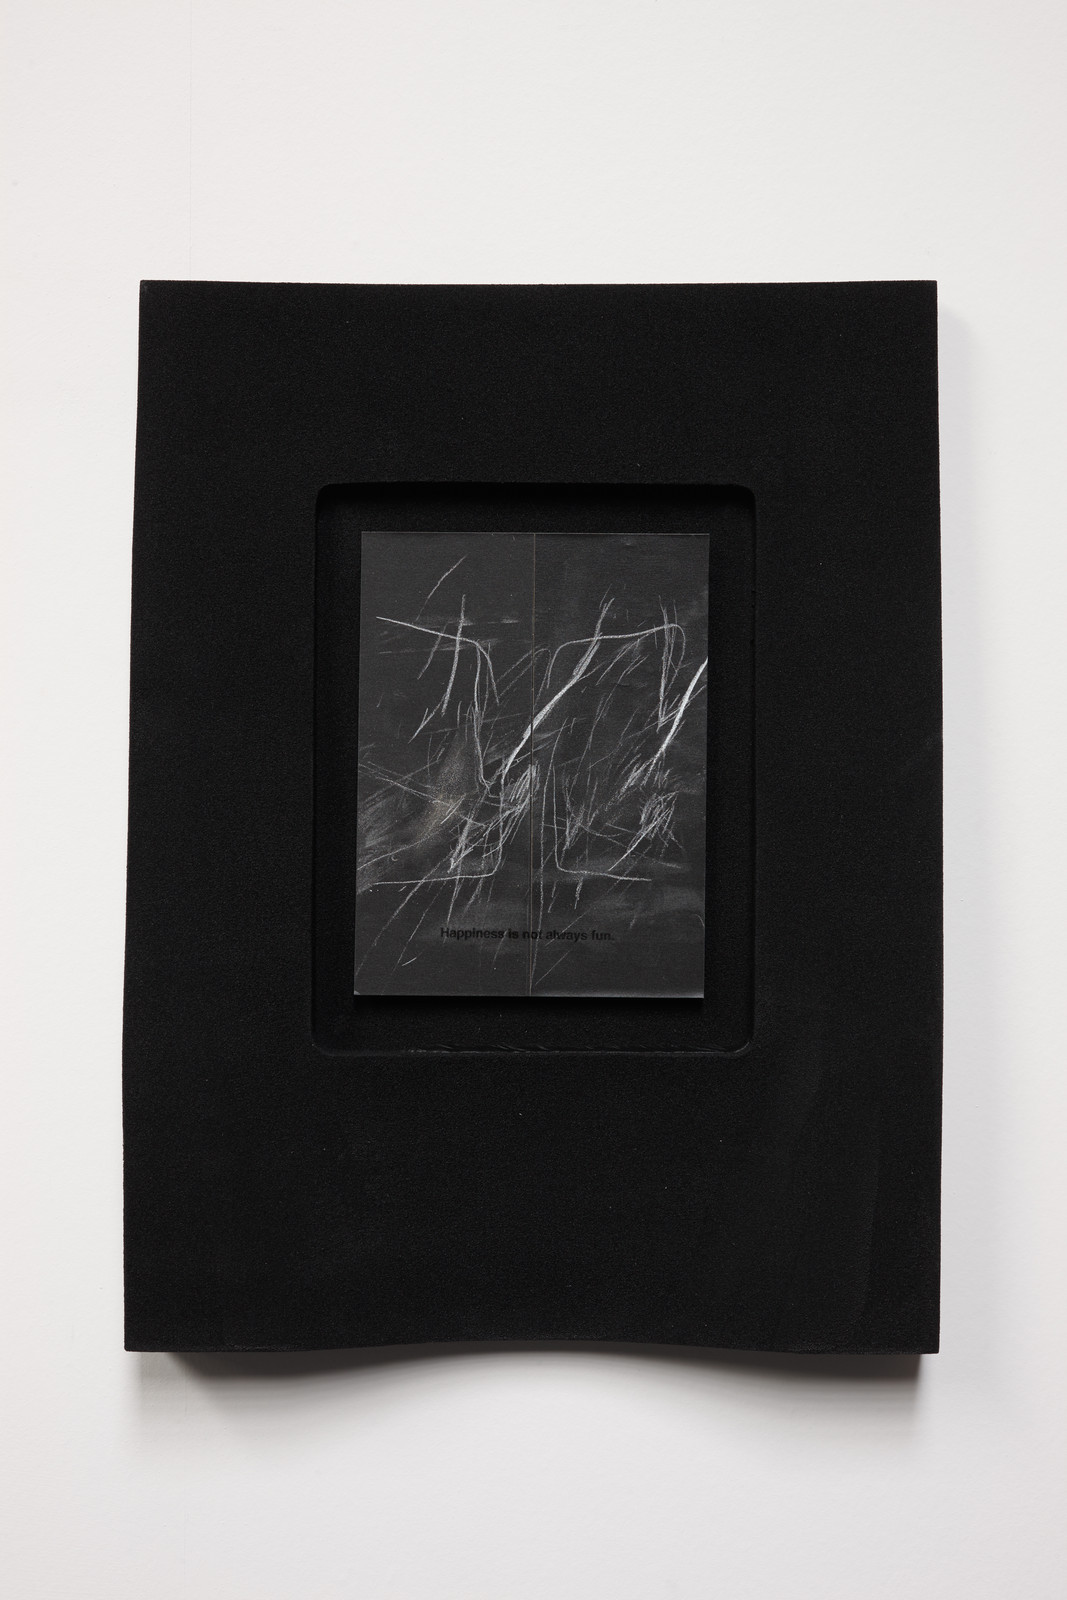 Ryan Estep - Untitled, 2016